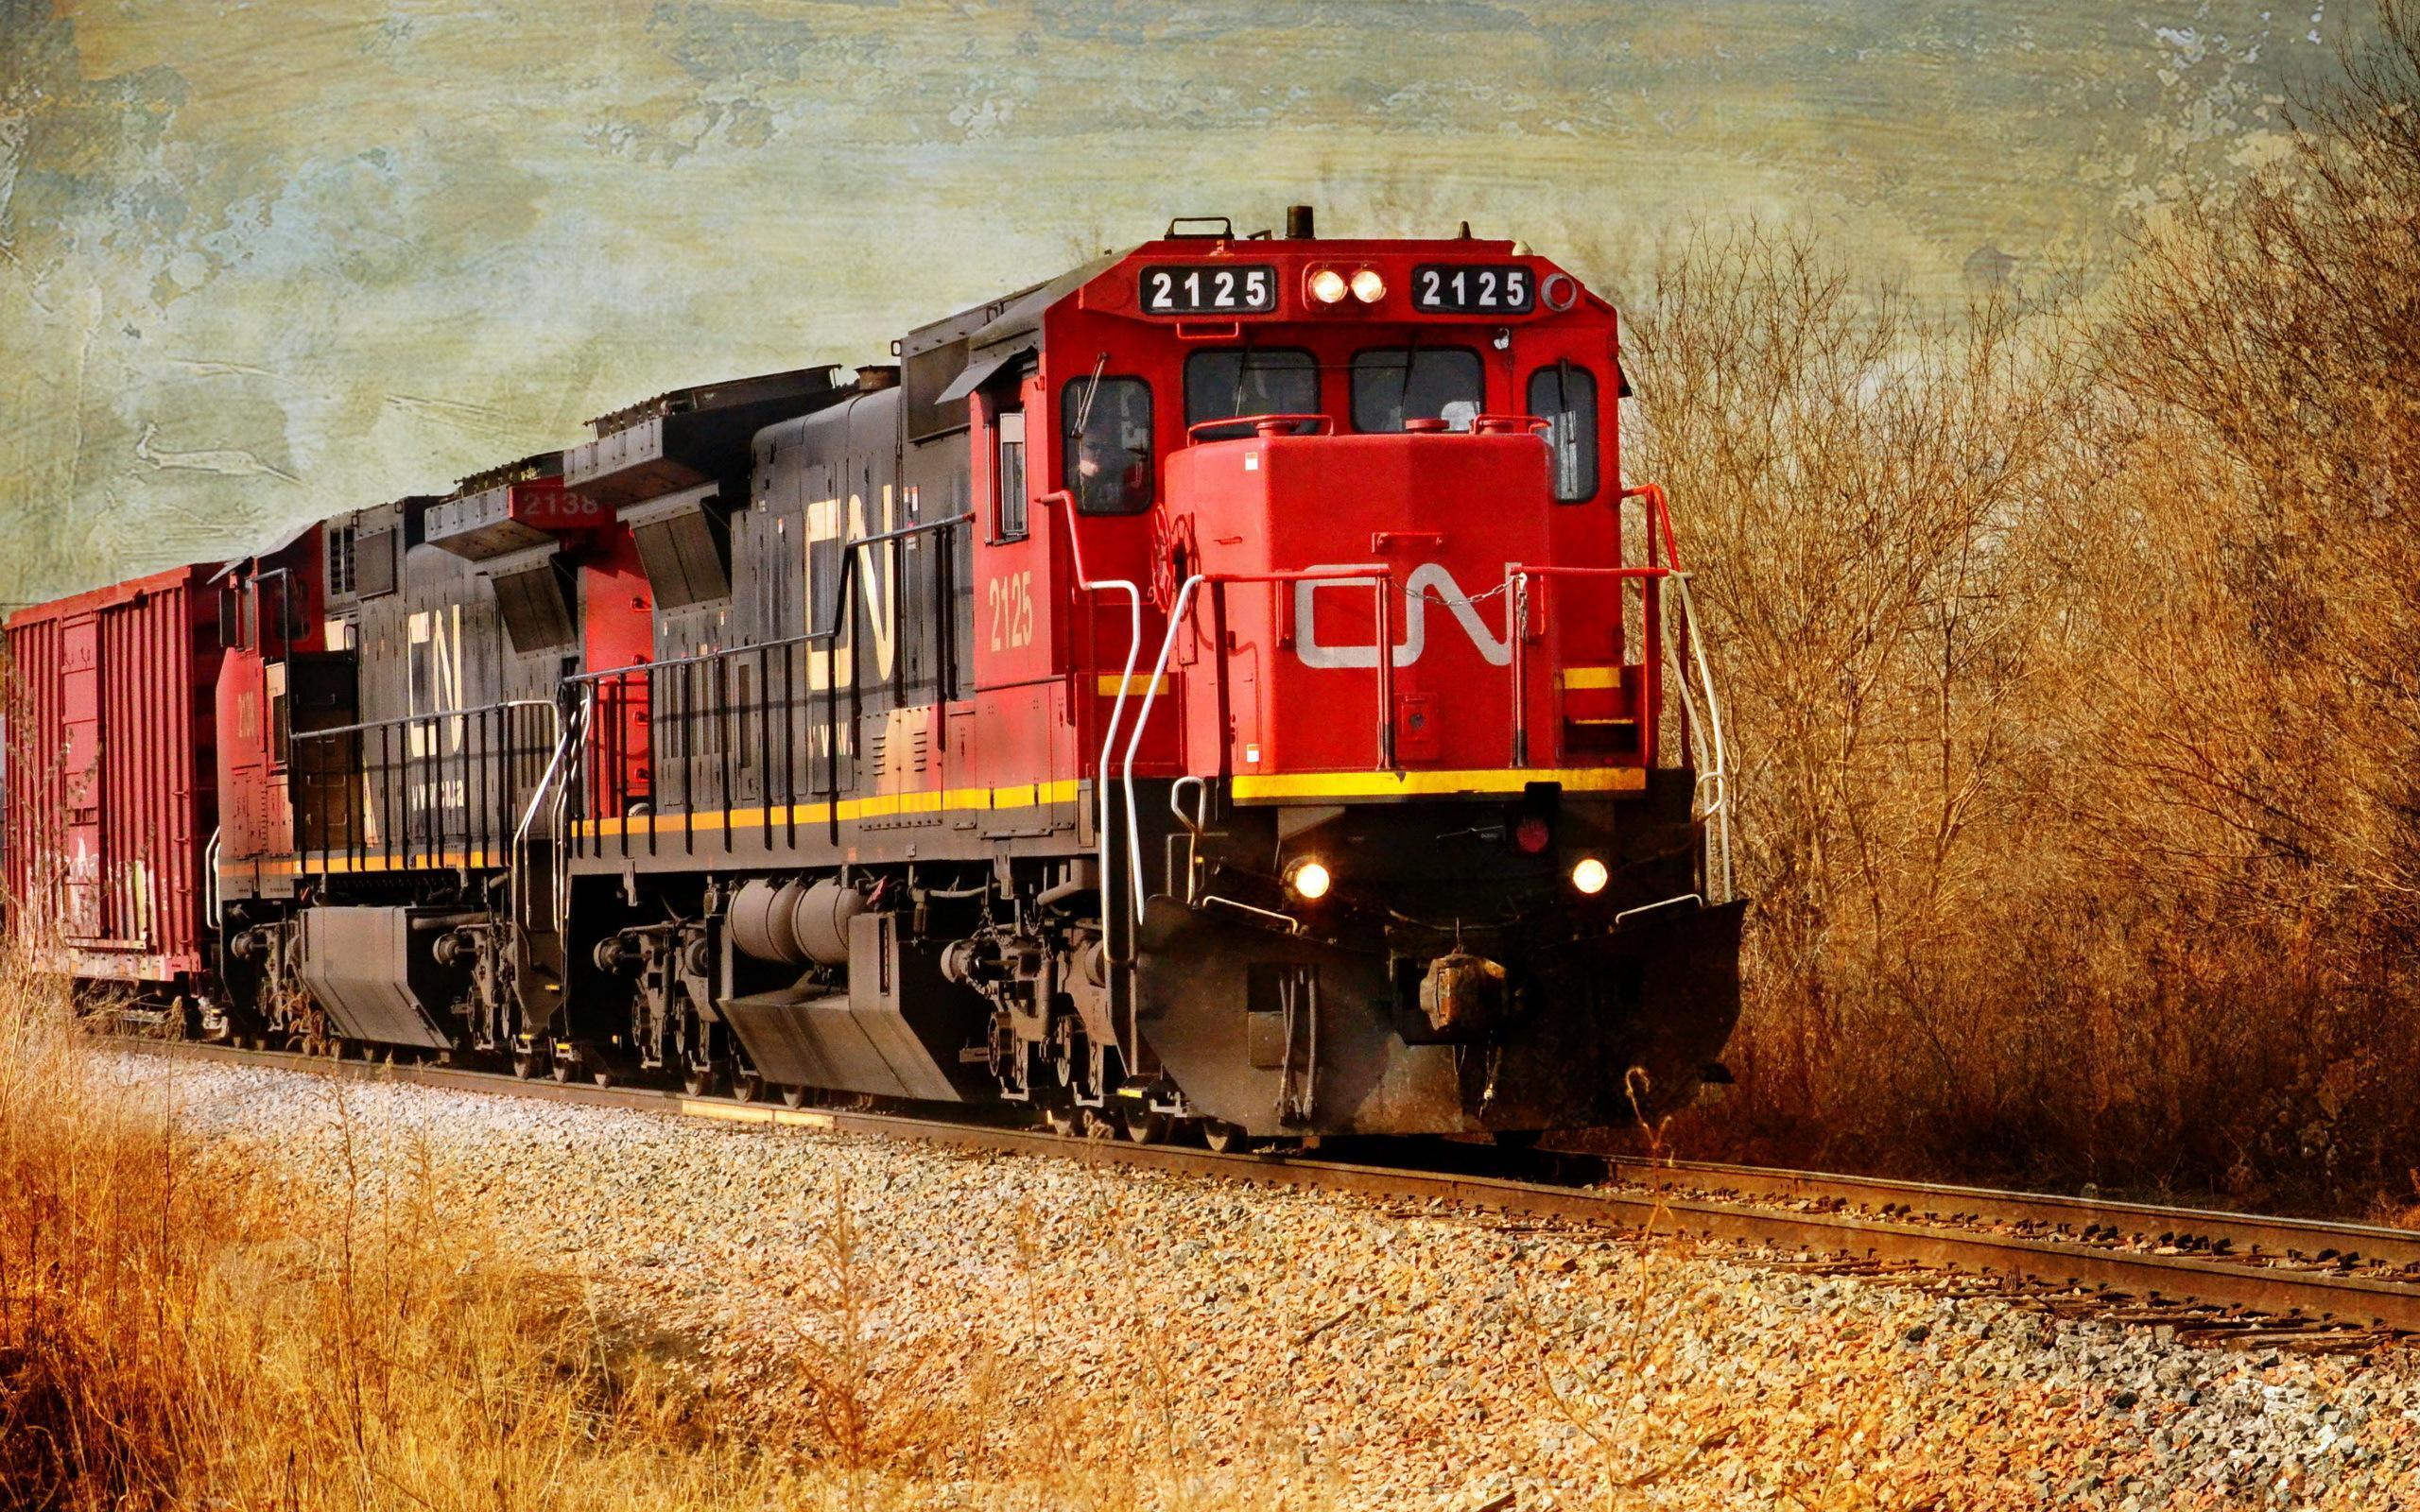 Train Tracks 4K Mobile Wallpapers - Top Free Train Tracks 4K